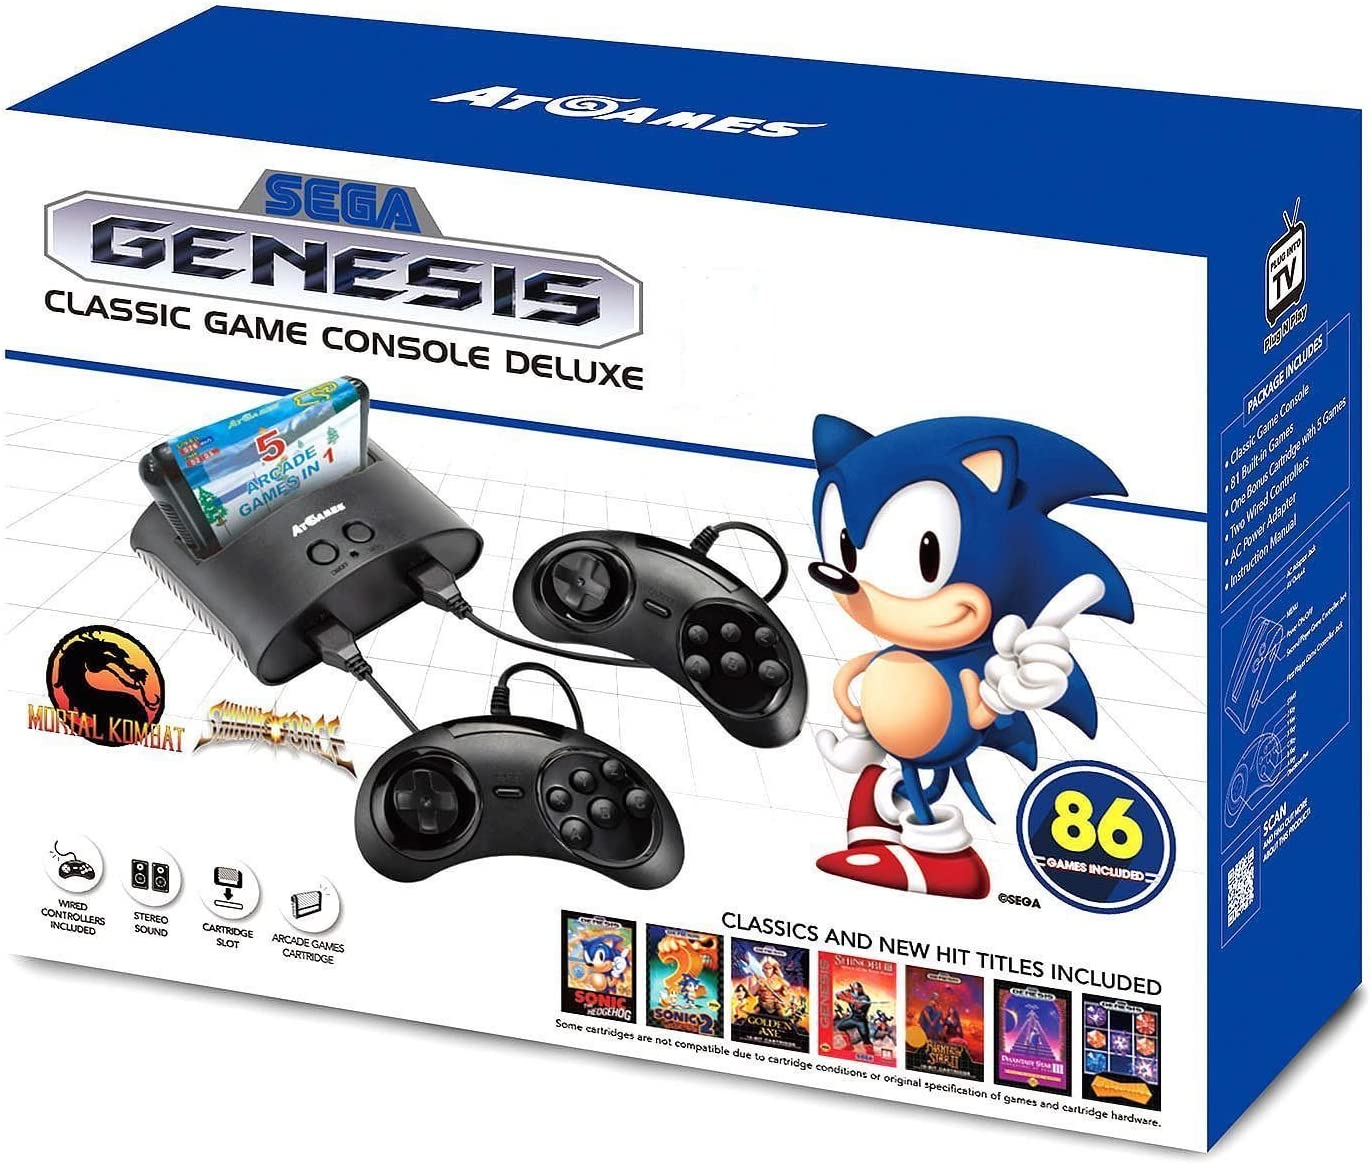 Amazoncom Sega Genesis Classic Game Console Deluxe Special Edition